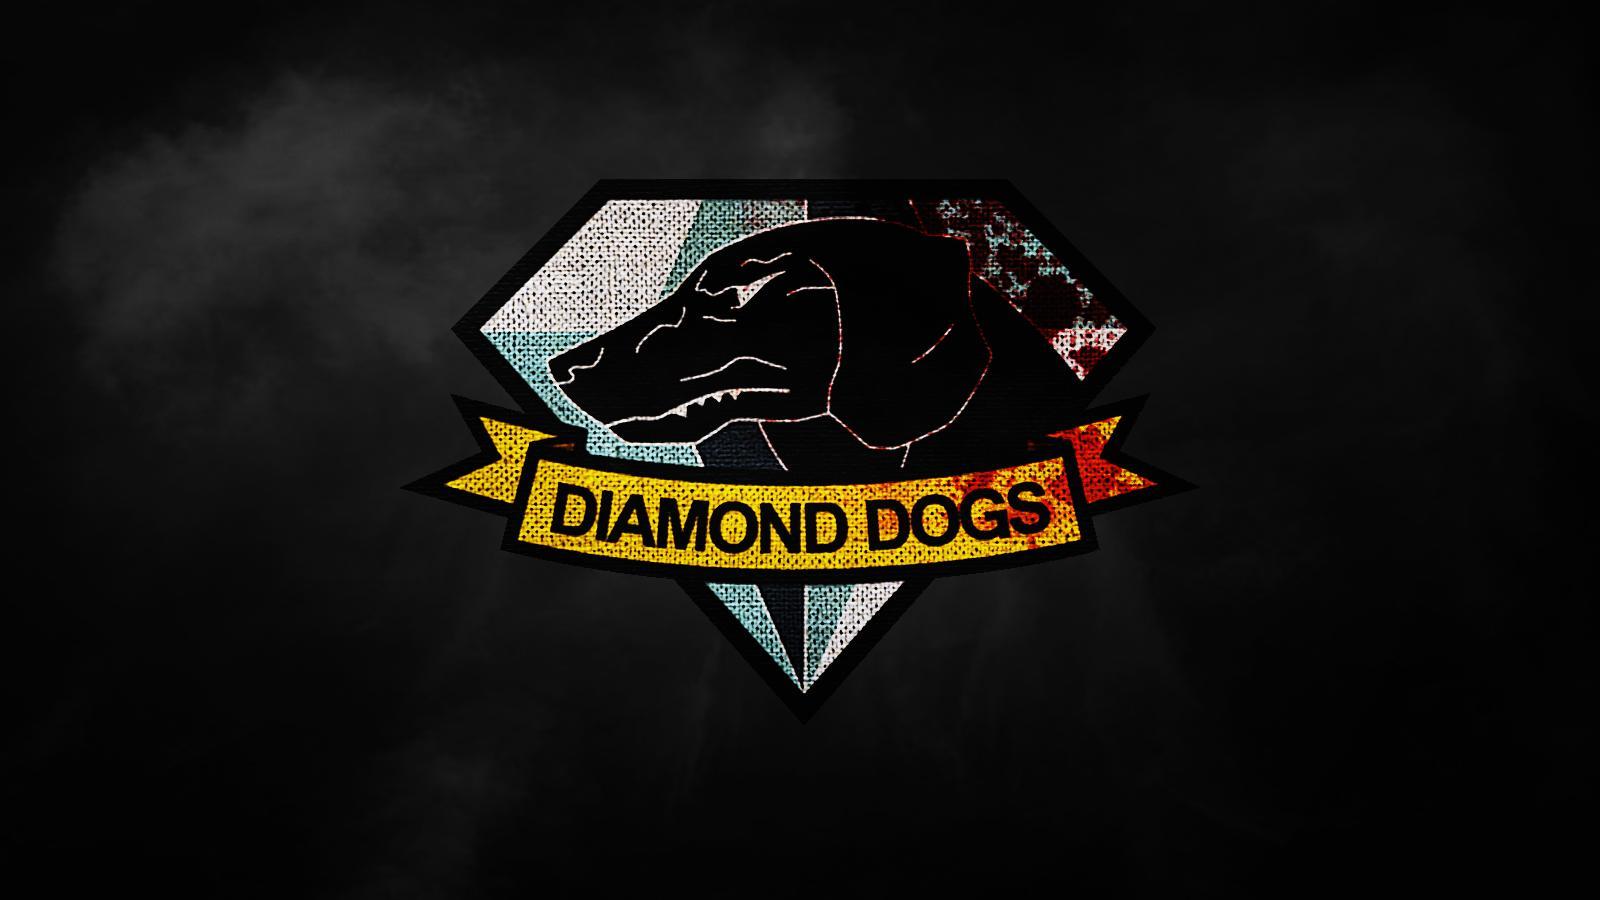 MGSV Diamond Dogs Patch Wallpaper [1600x900] metalgearsolid 1600x900